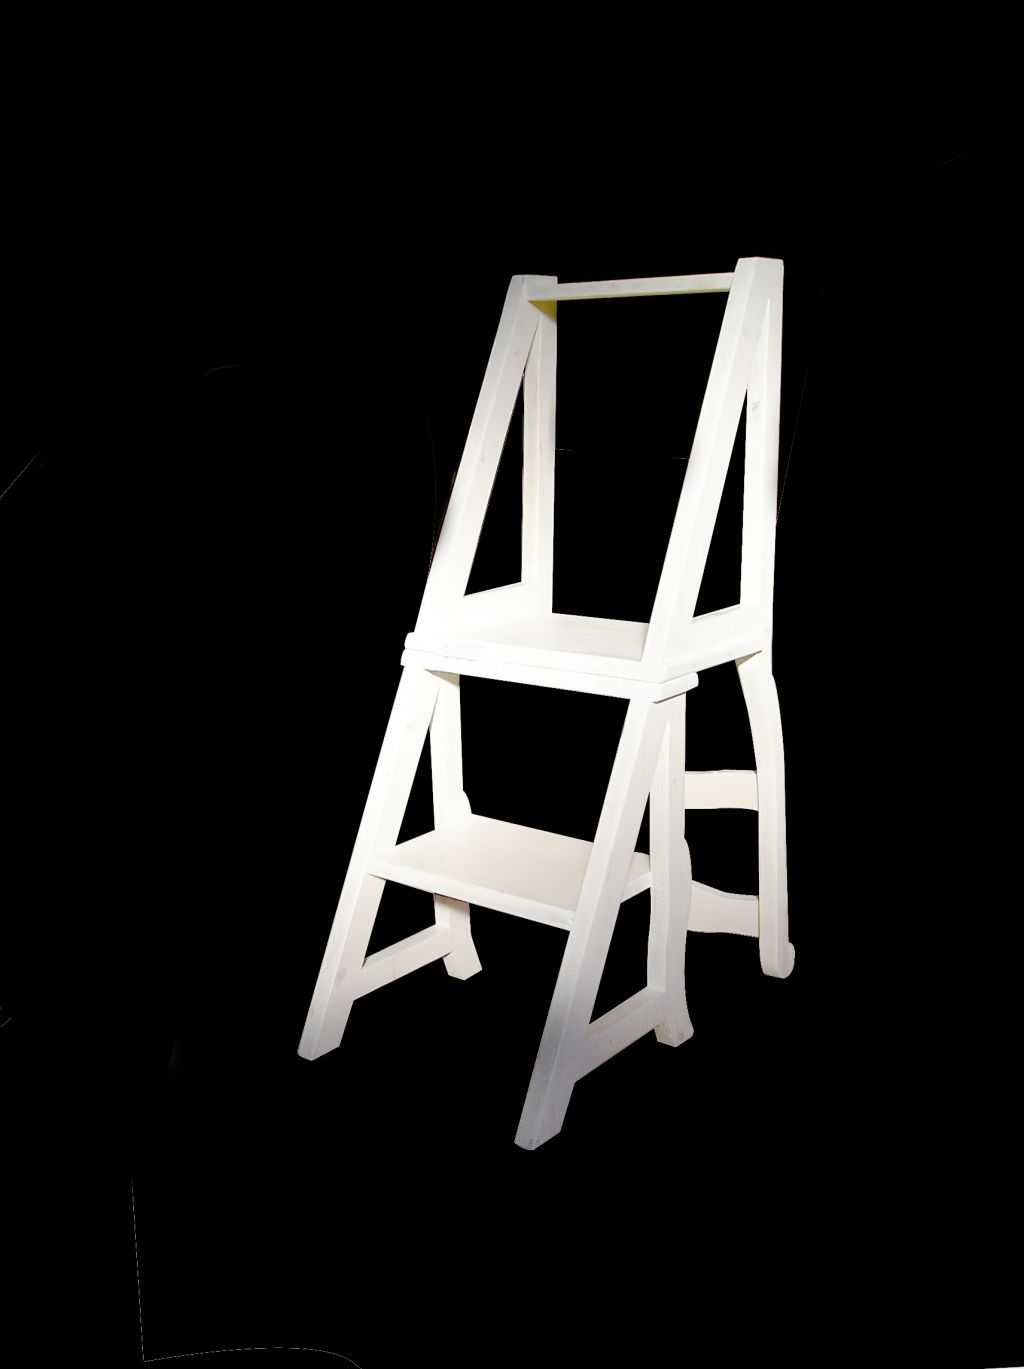 menuiserie b nisterie cr ation d 39 ouvrage en bois menuiserie charpente v randas et bricolage. Black Bedroom Furniture Sets. Home Design Ideas